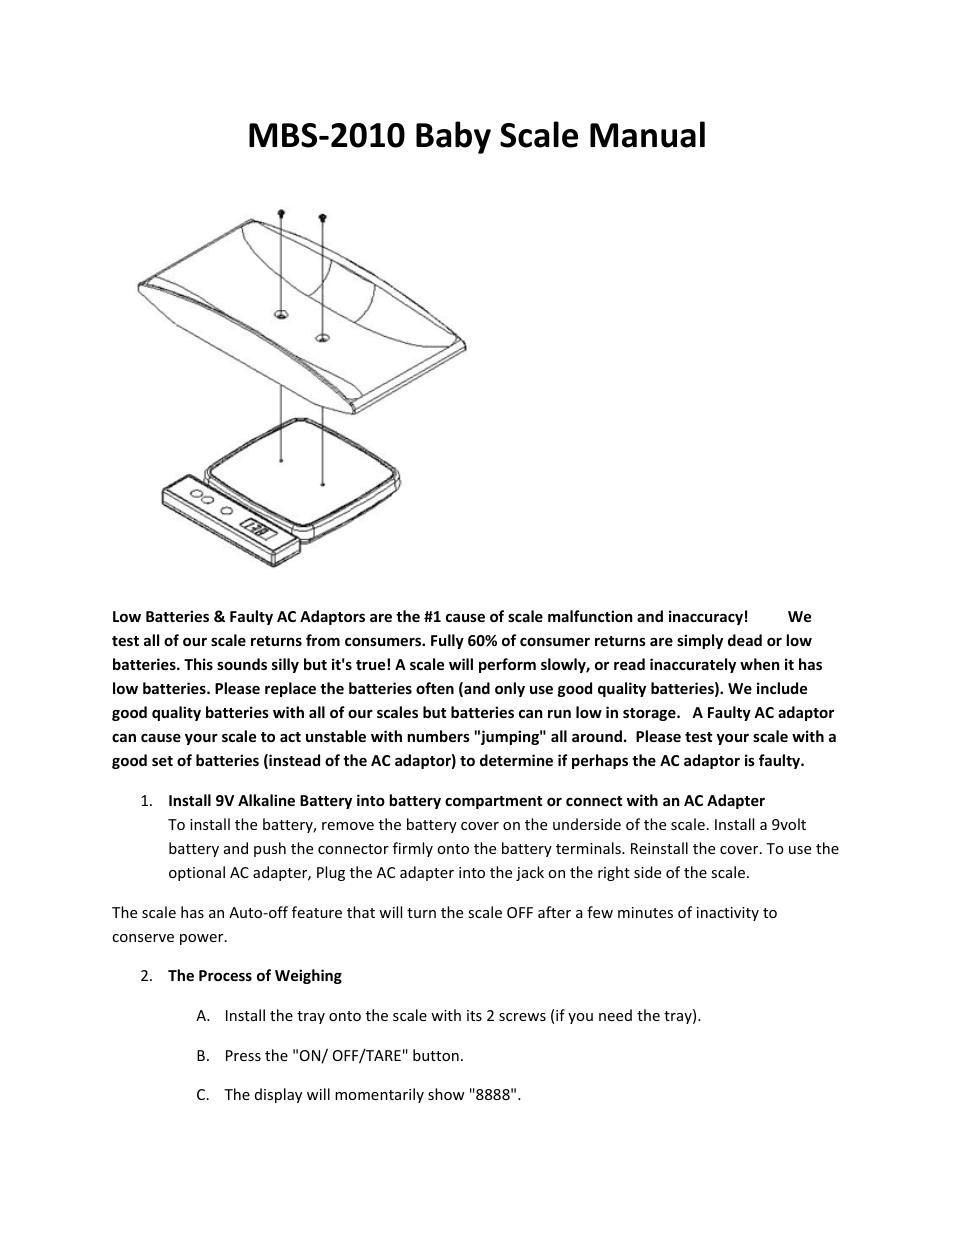 Myweigh Mbs 2010 User Manual 3 Pages Phone Jack Wiring Diagram